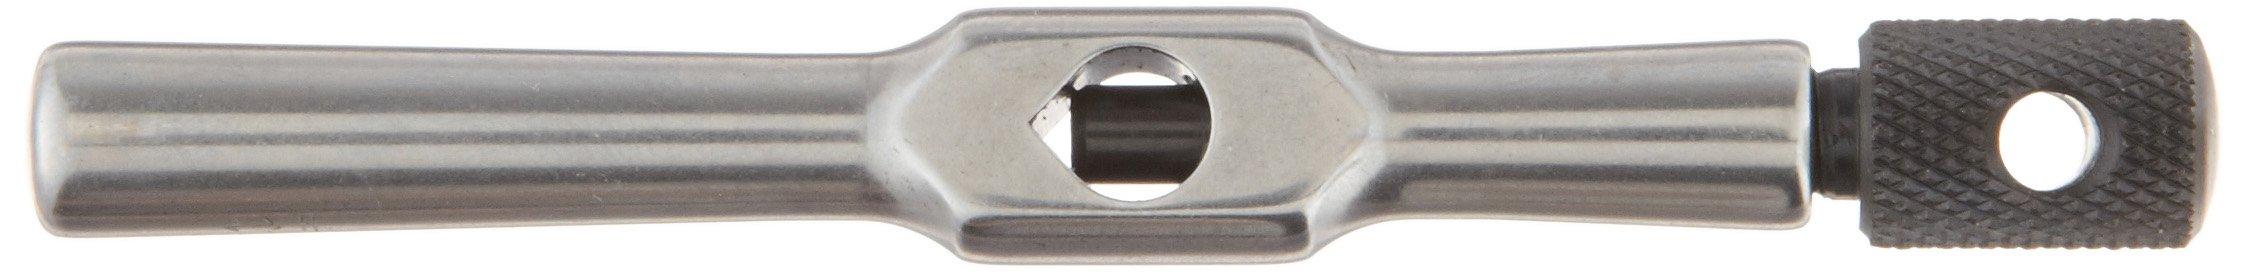 Starrett 174 Tap Wrench, No. 0-14 Tap Size, 1/4'' Square Shank Diameter, 3-5/8'' Body Length by Starrett